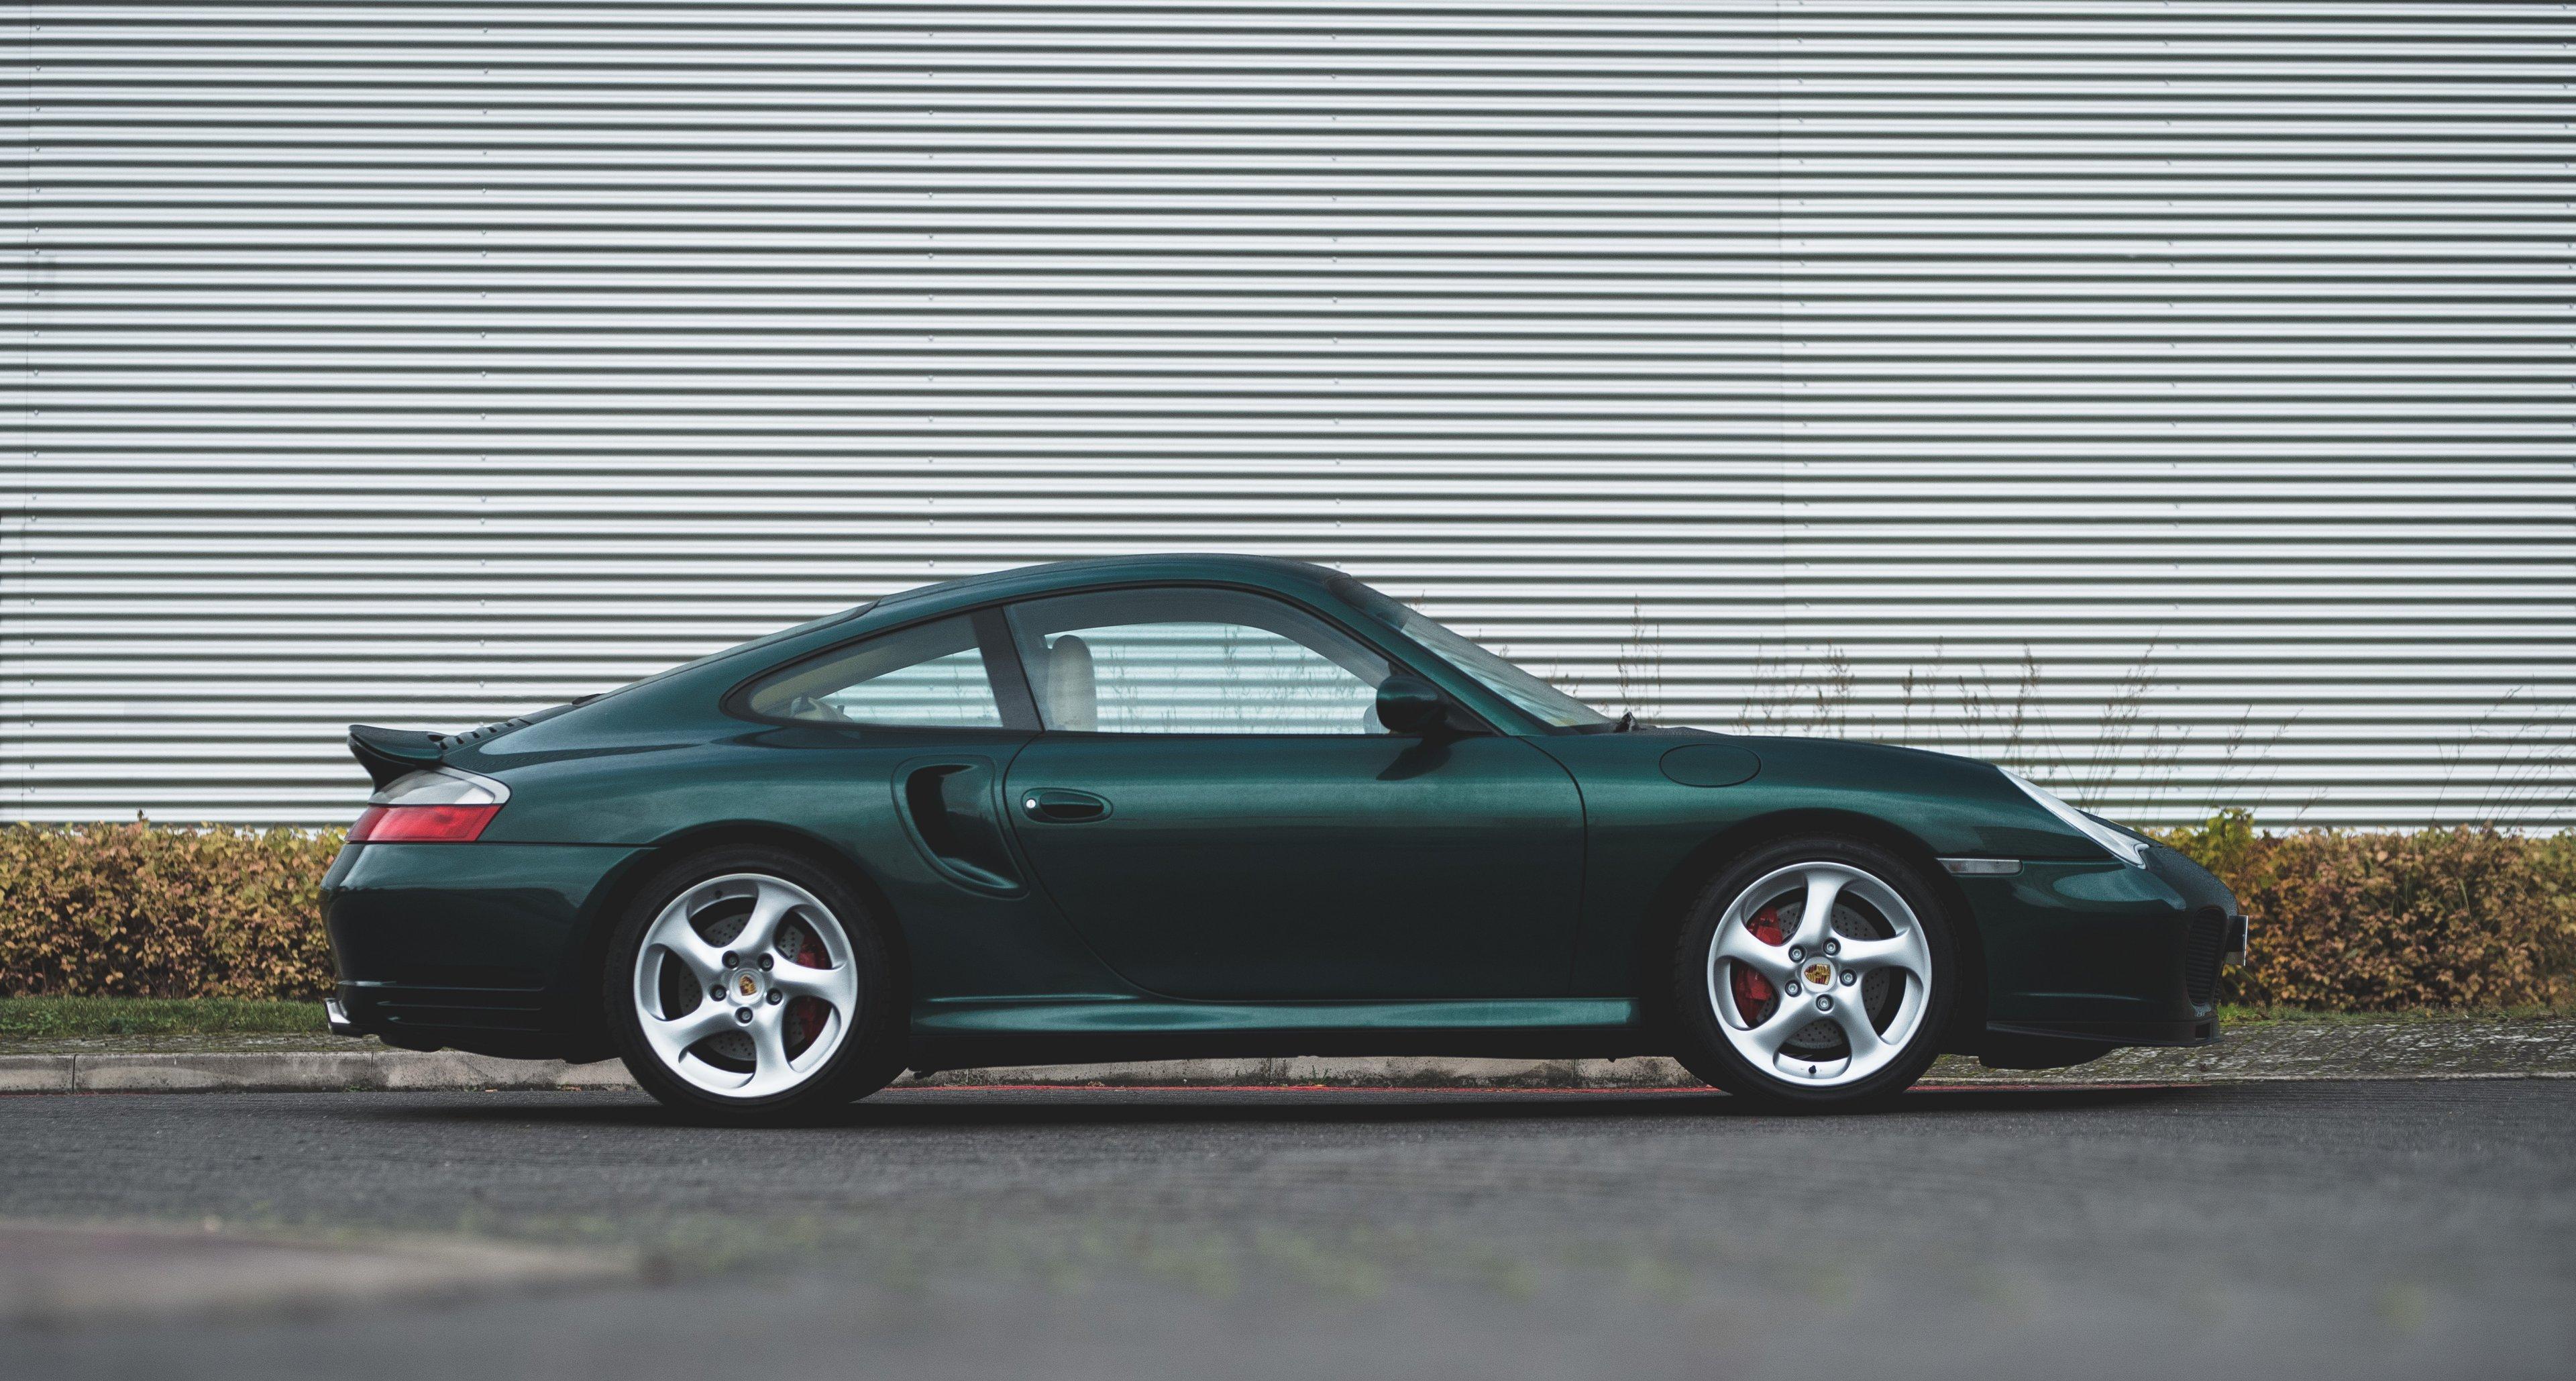 Porsche 996 Turbo >> Last Boarding Call For All Porsche 996 Turbo Buyers